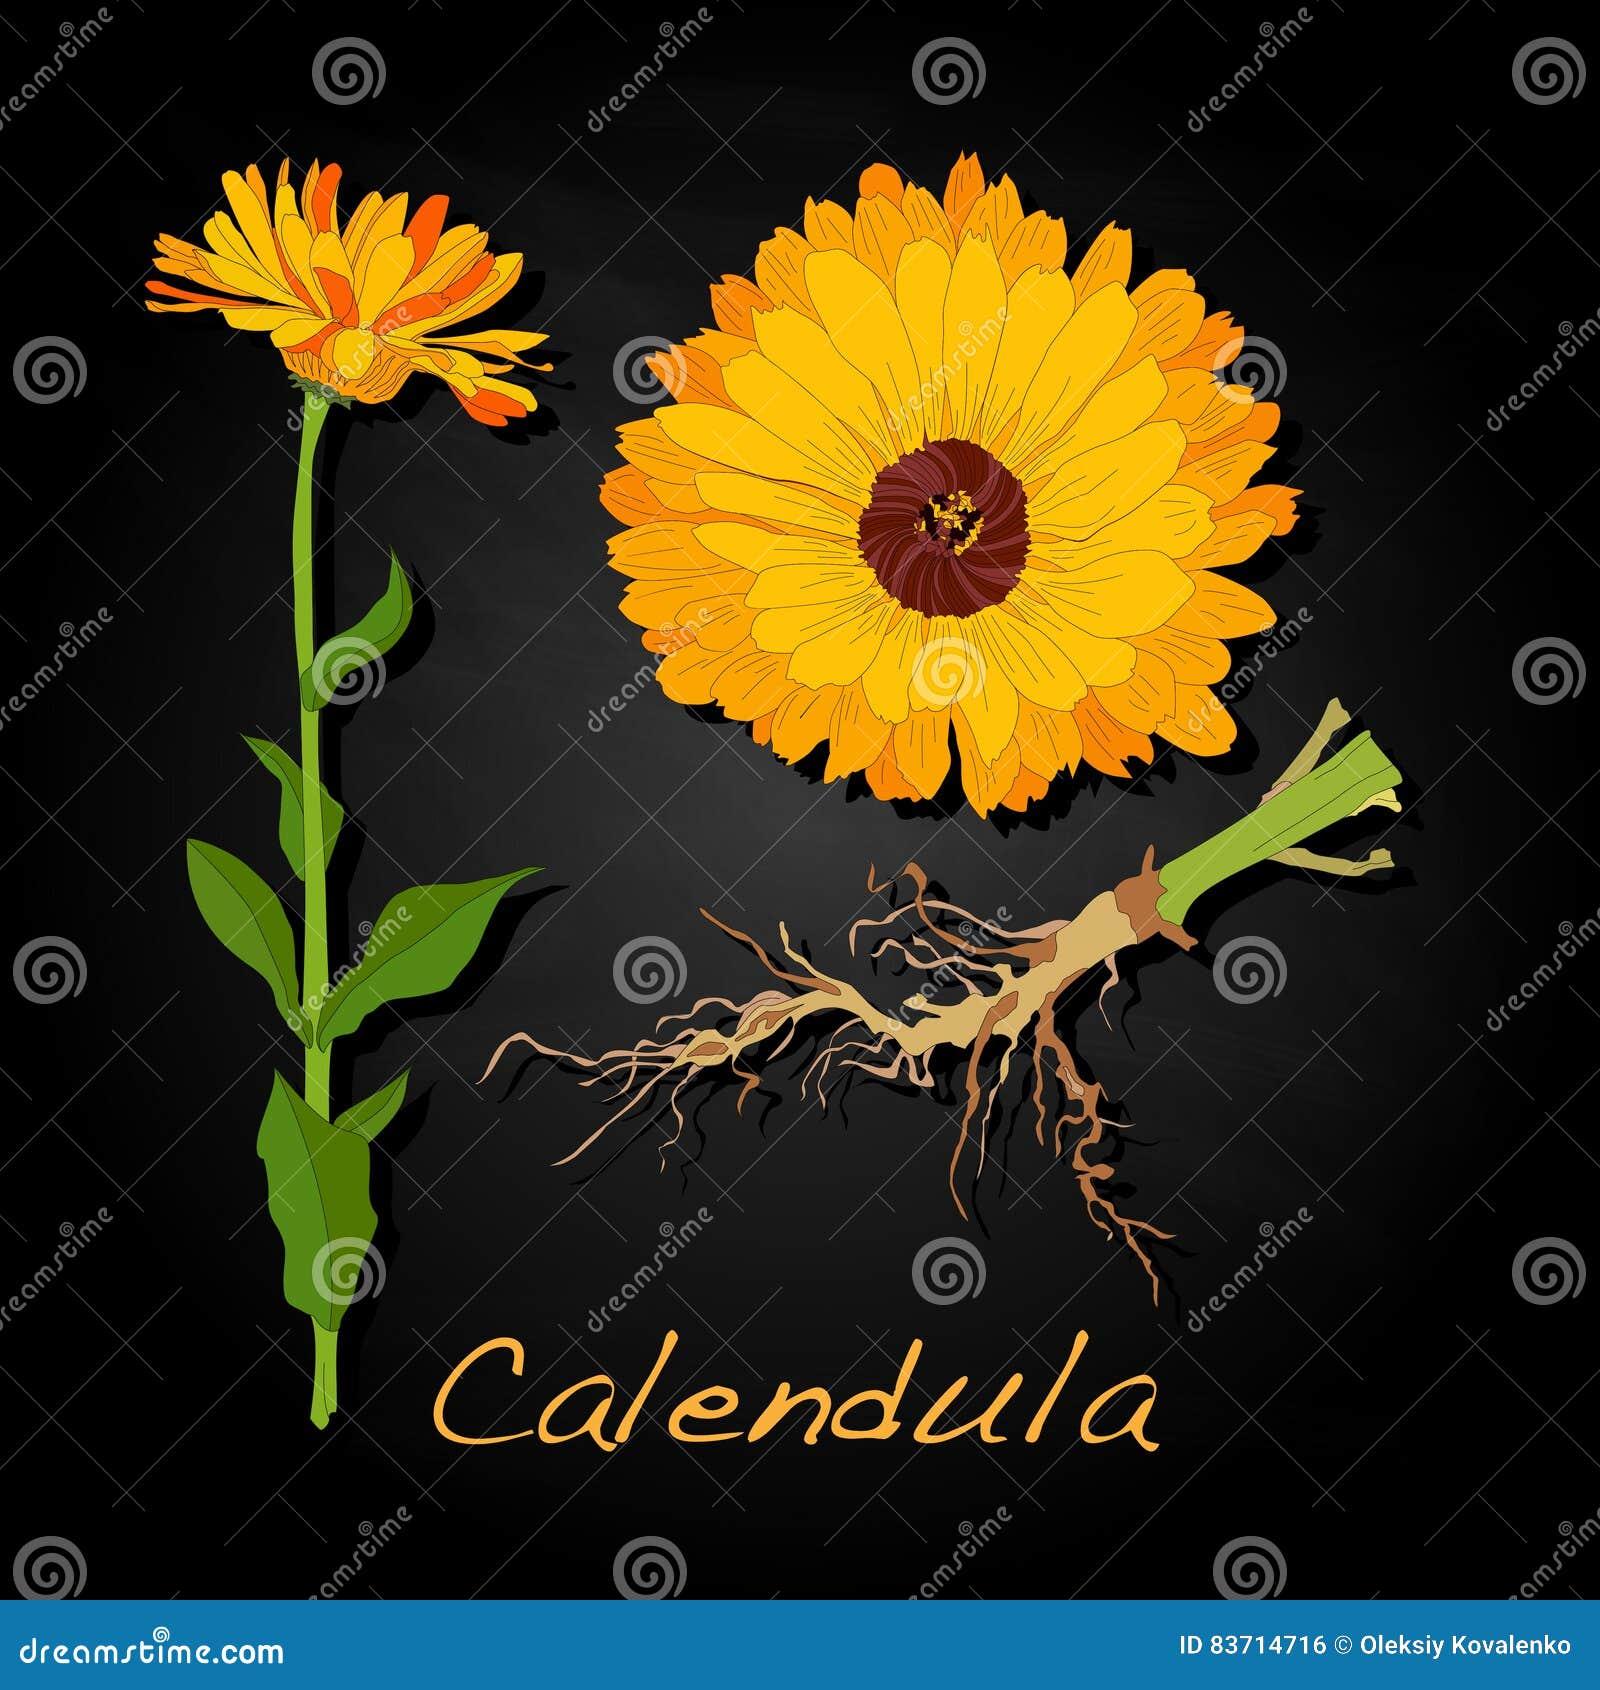 Calendula Vector Illustration Stock Vector